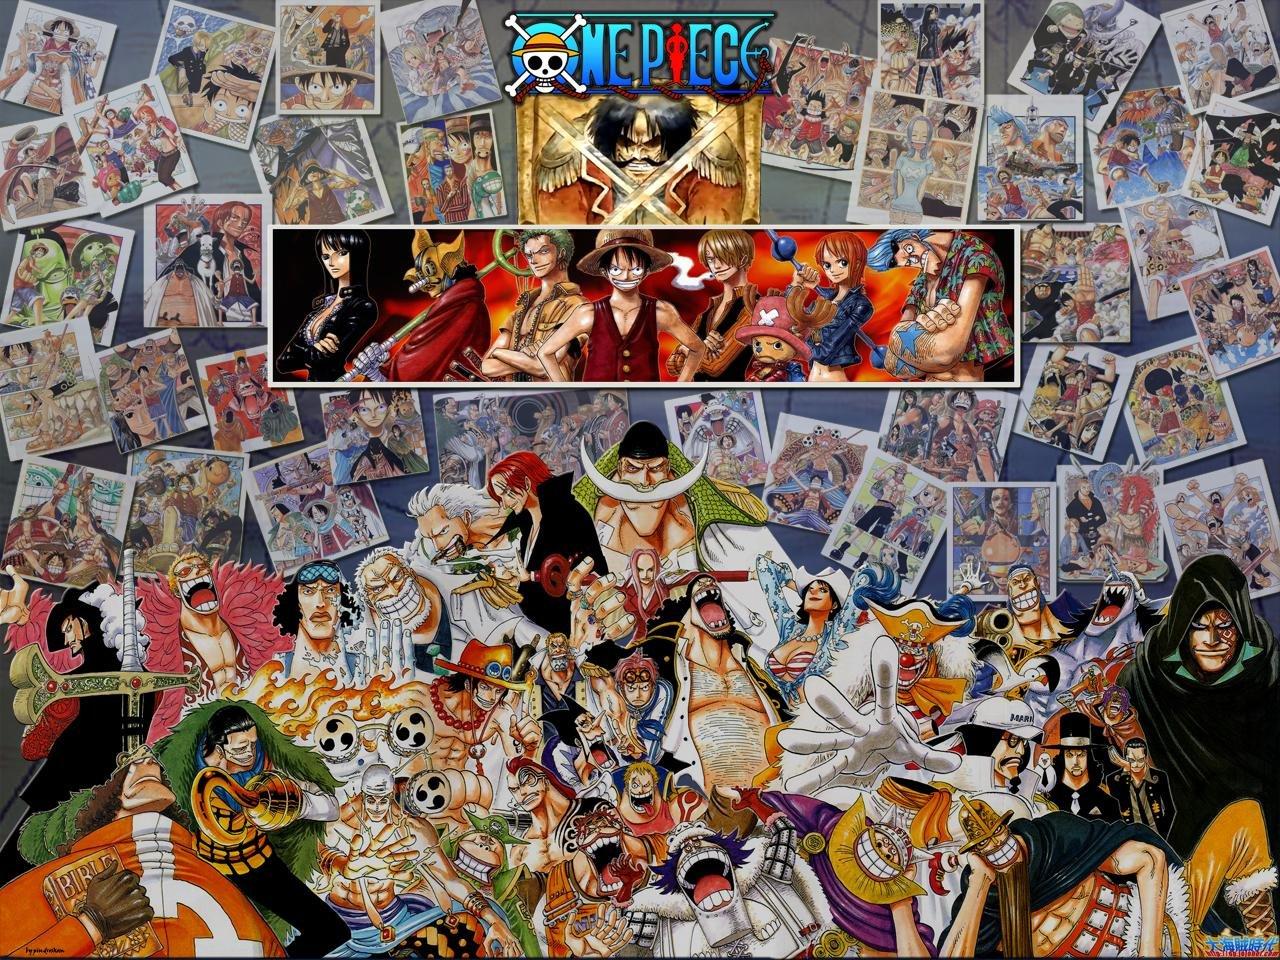 One Piece All Characters Anime Manga Wallpaper HD Widescreen 1280x960